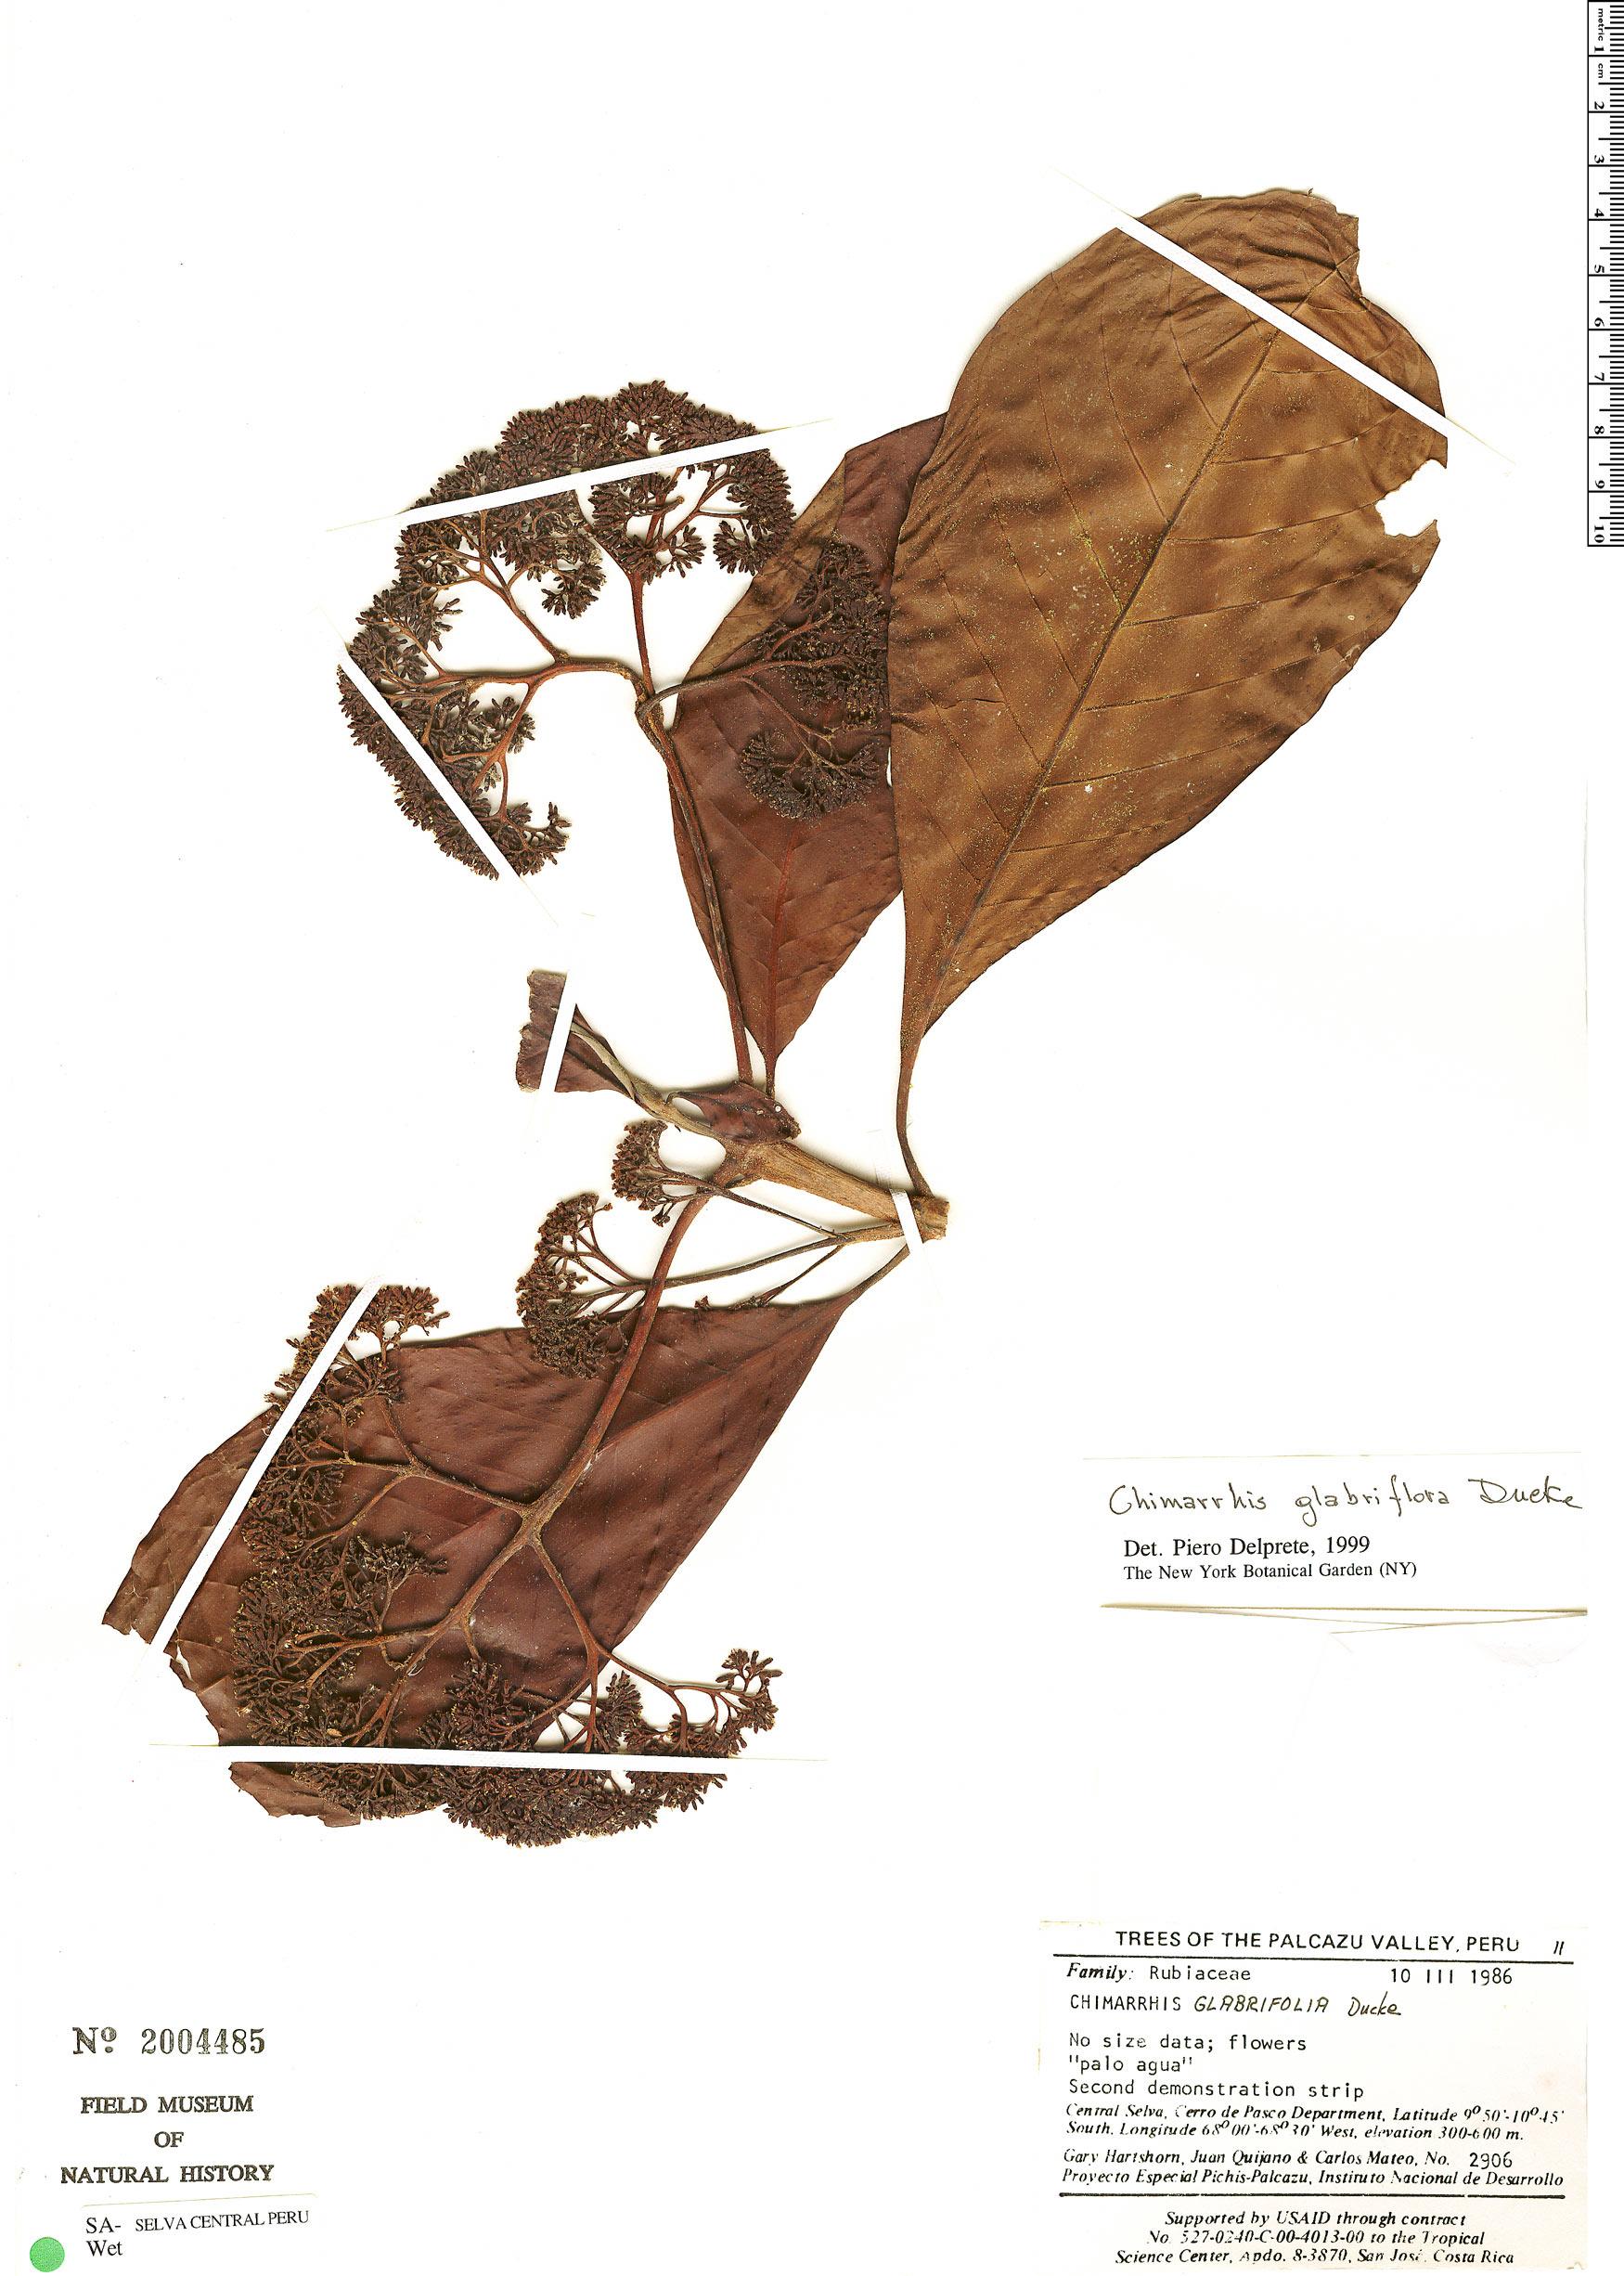 Specimen: Chimarrhis glabriflora